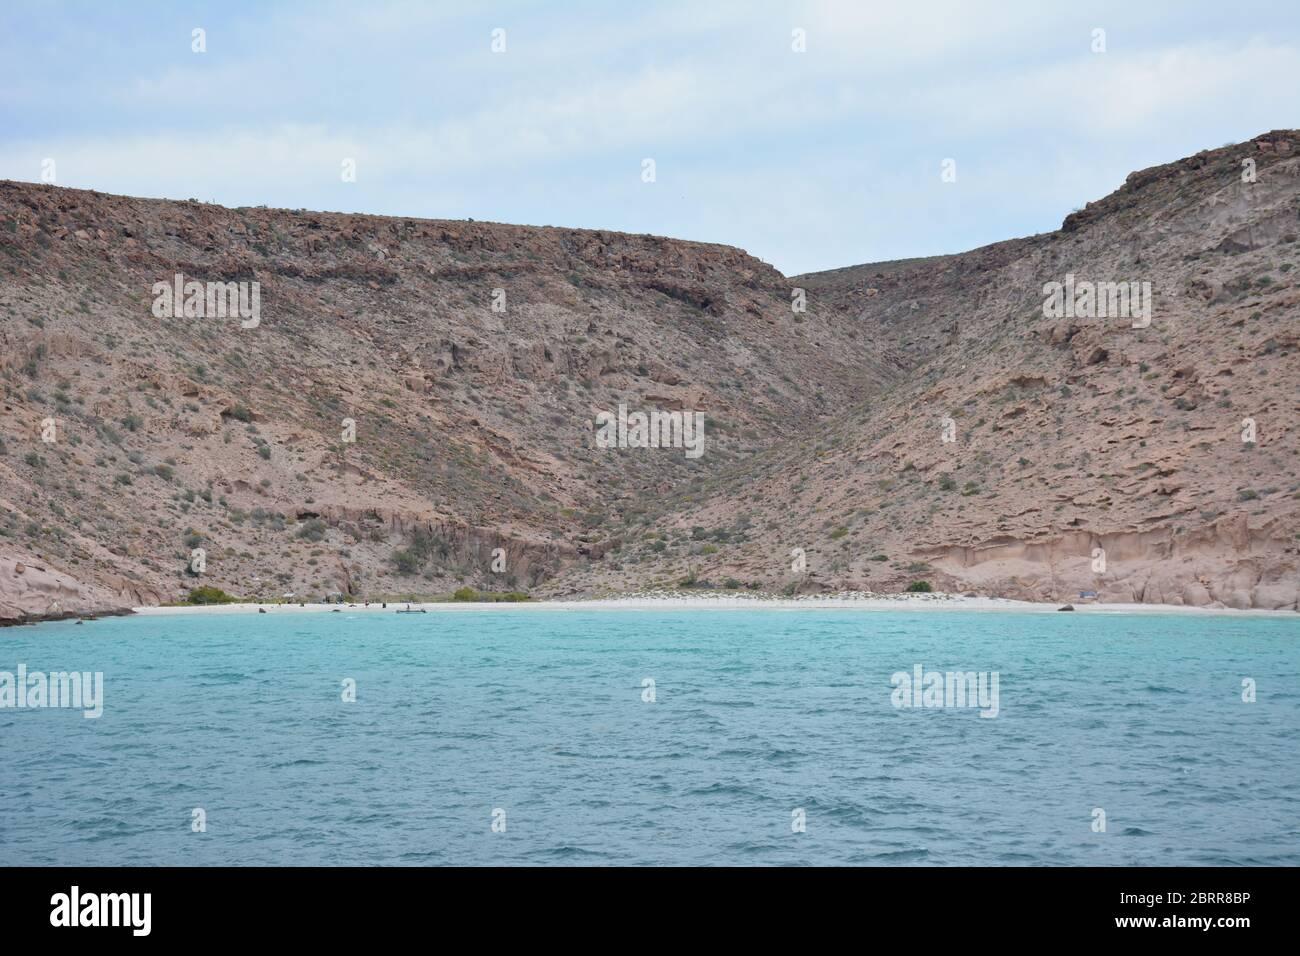 A choppy day at Playa Ensenada Grande on Isla Espiritu Santo, Sea of Cortez, Baja California Sur, Mexico. Stock Photo